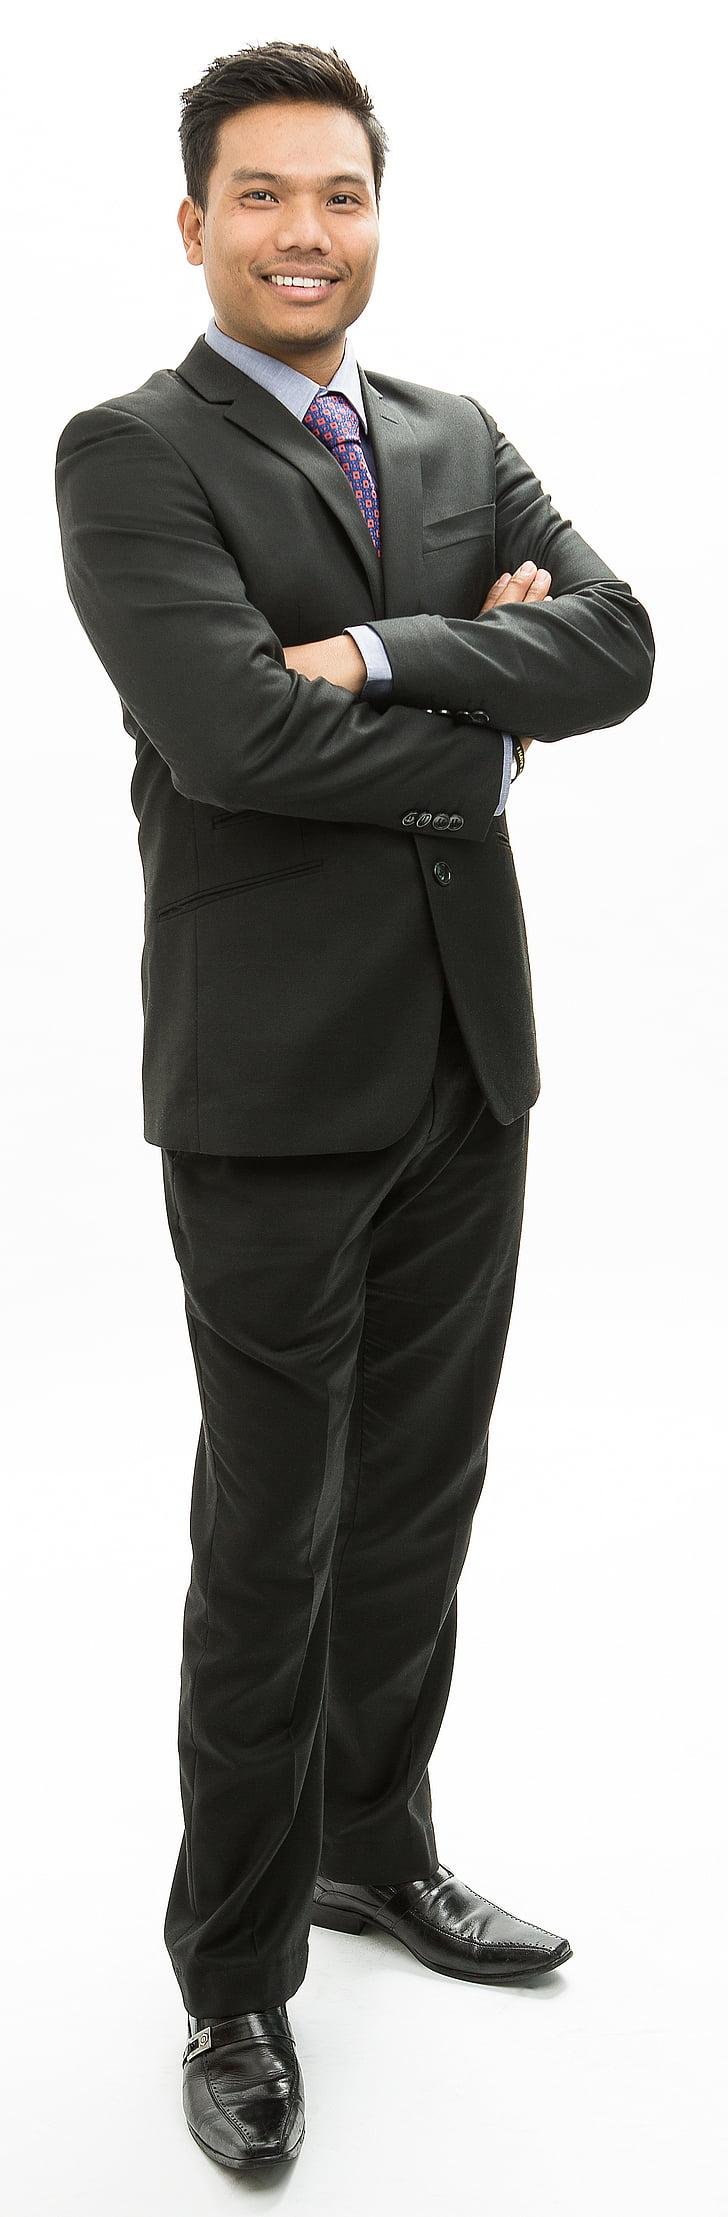 male, businessman, asian, suit, tie, model, standing